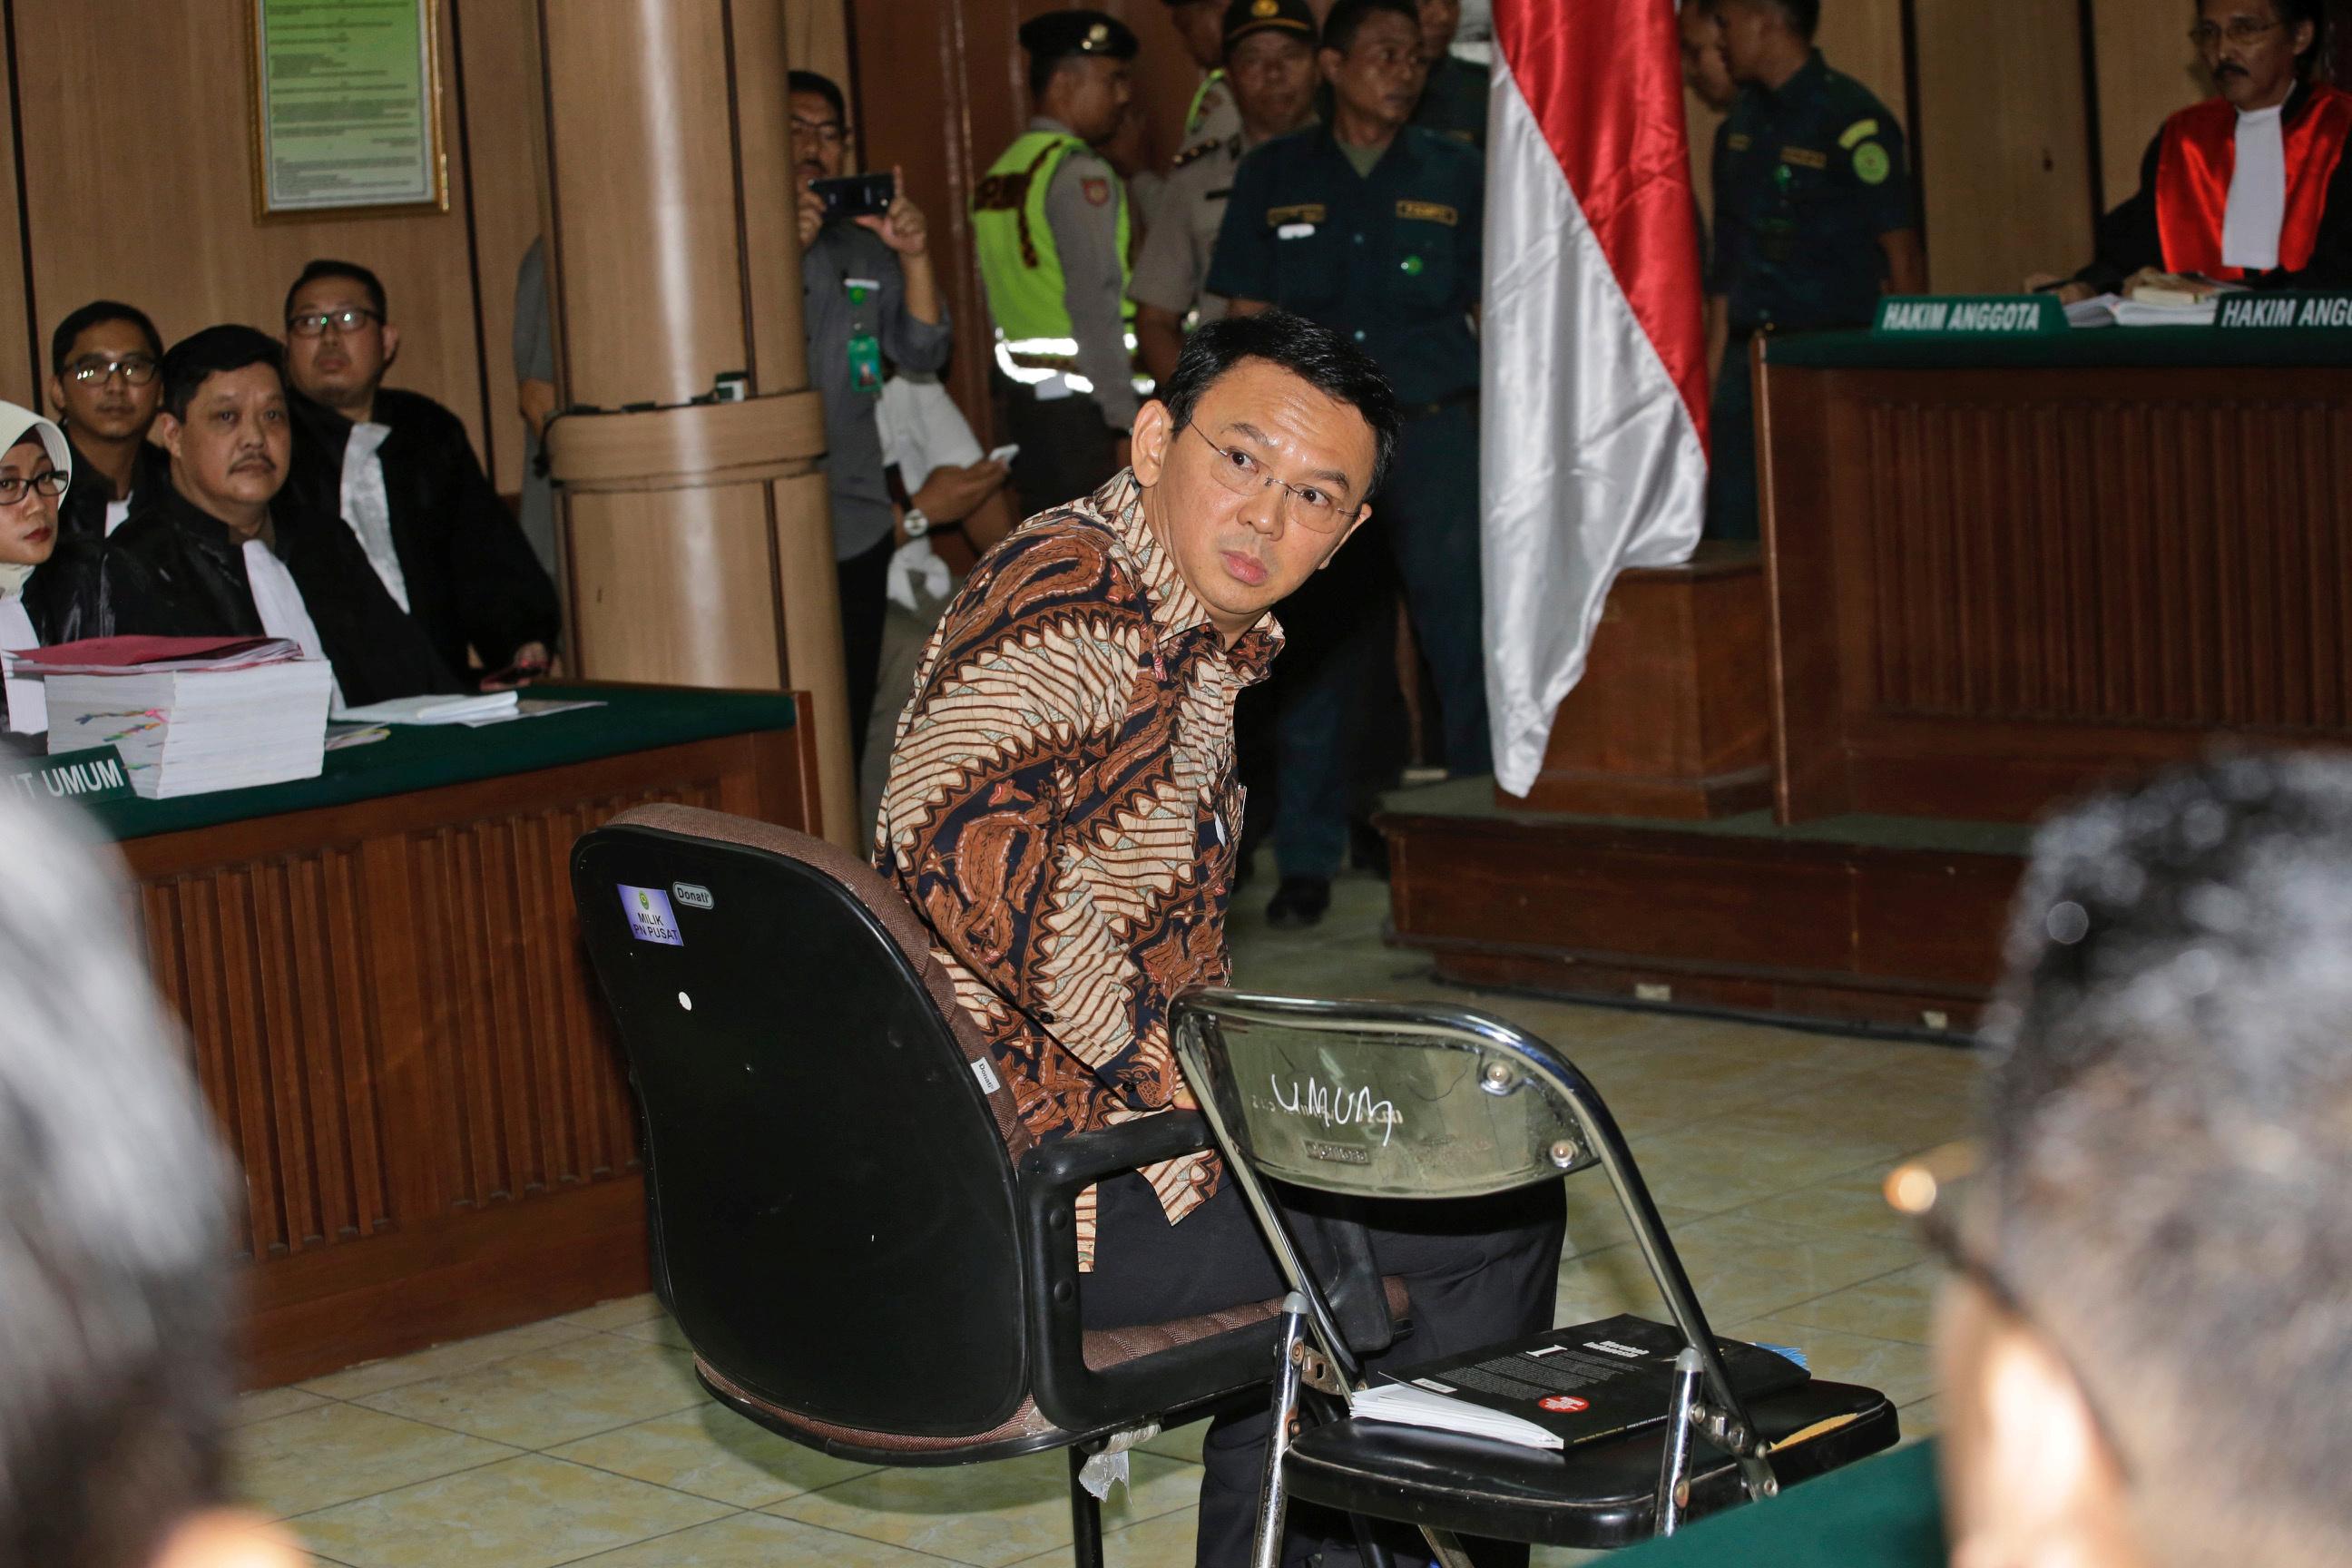 Gubernur Jakarta Basuki Tjahaja Purnama, lebih dikenal sebagai  Ahok , duduk di kursi terpidana saat sidang kasus penistaan agama mulai di Pengadilan Negeri Jakarta Utara, di Jakarta, pada tanggal 13 Desember 2016